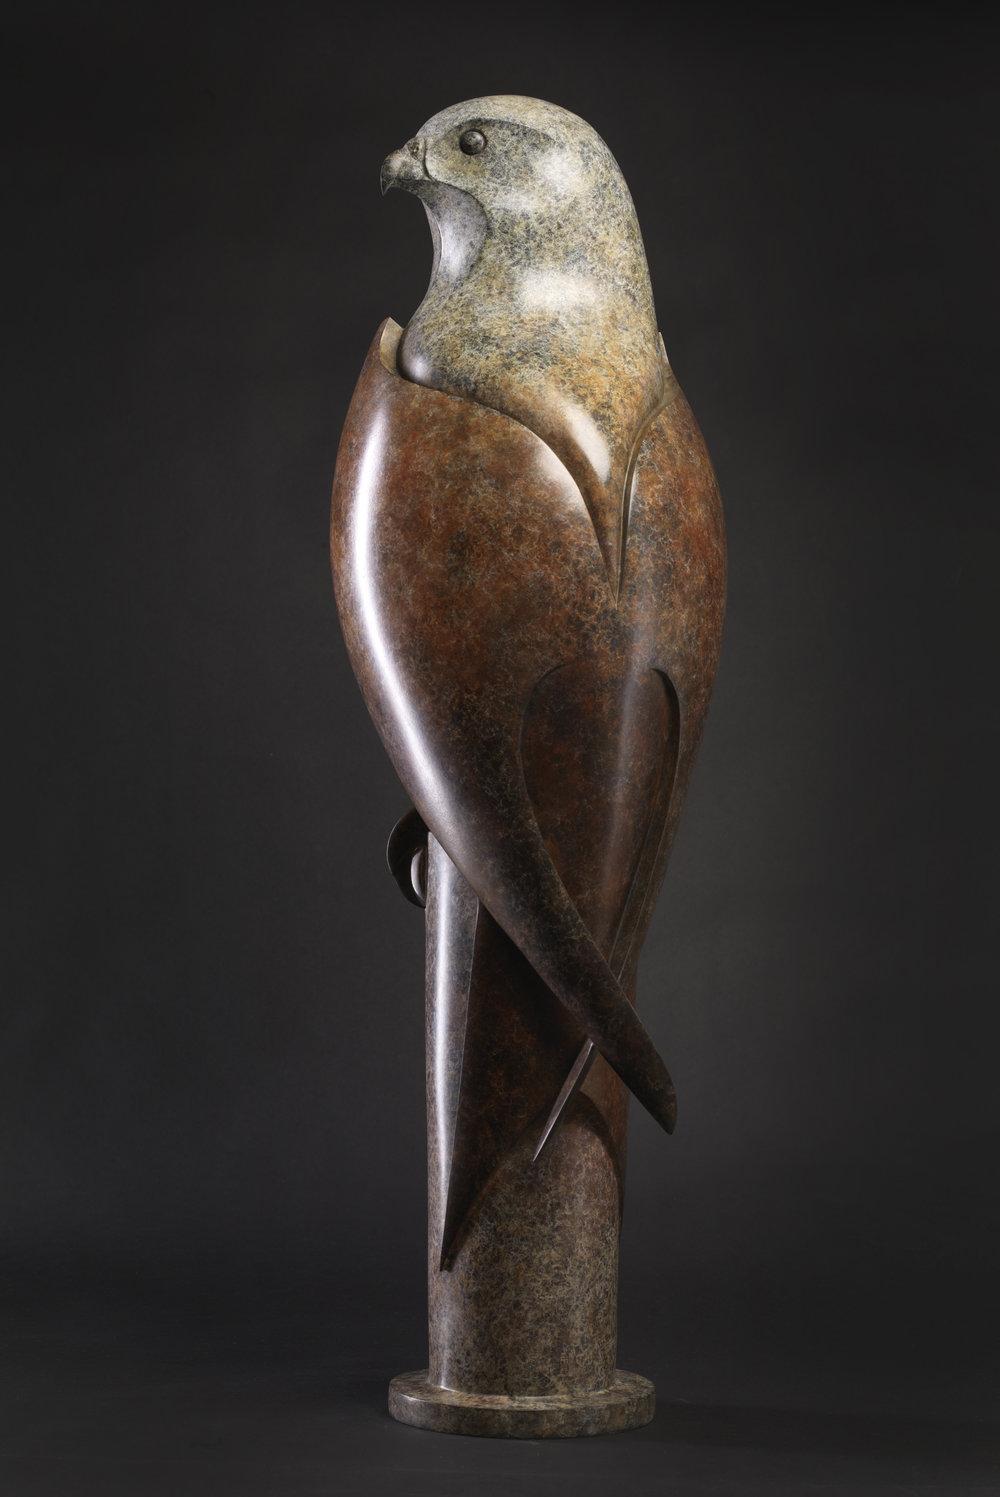 Red Kite .    £10,950 . H 77.5cm LE 7/12